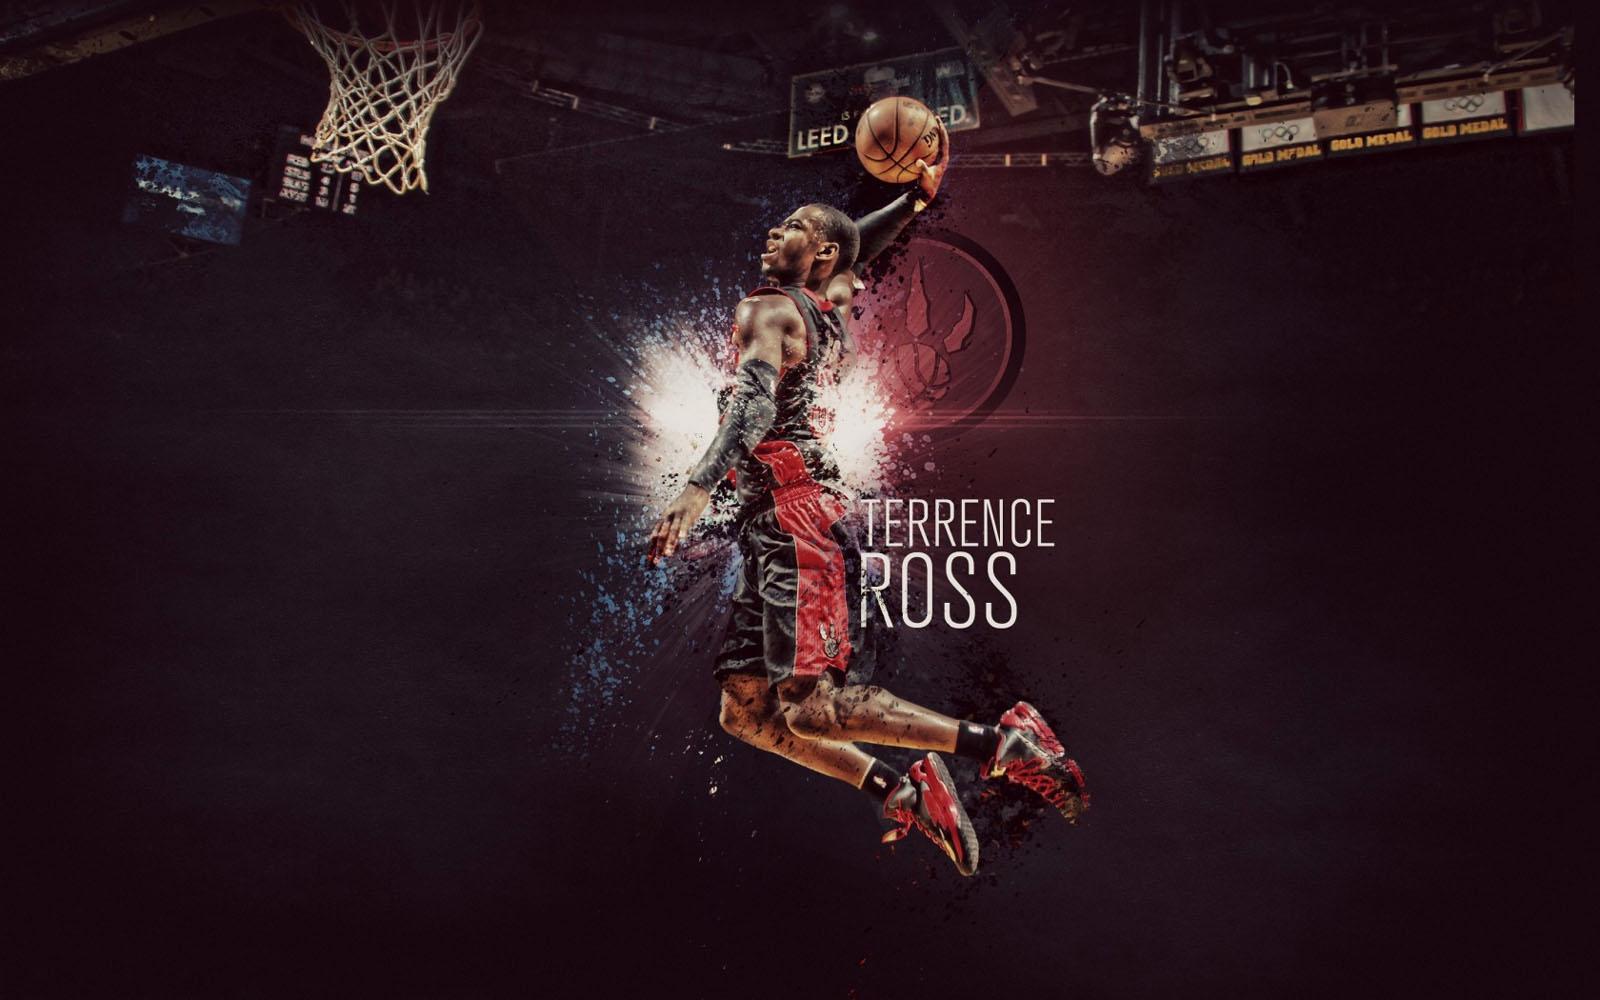 Terrence Ross 2013 Toronto Raptors Slam Dunk Nba Hd